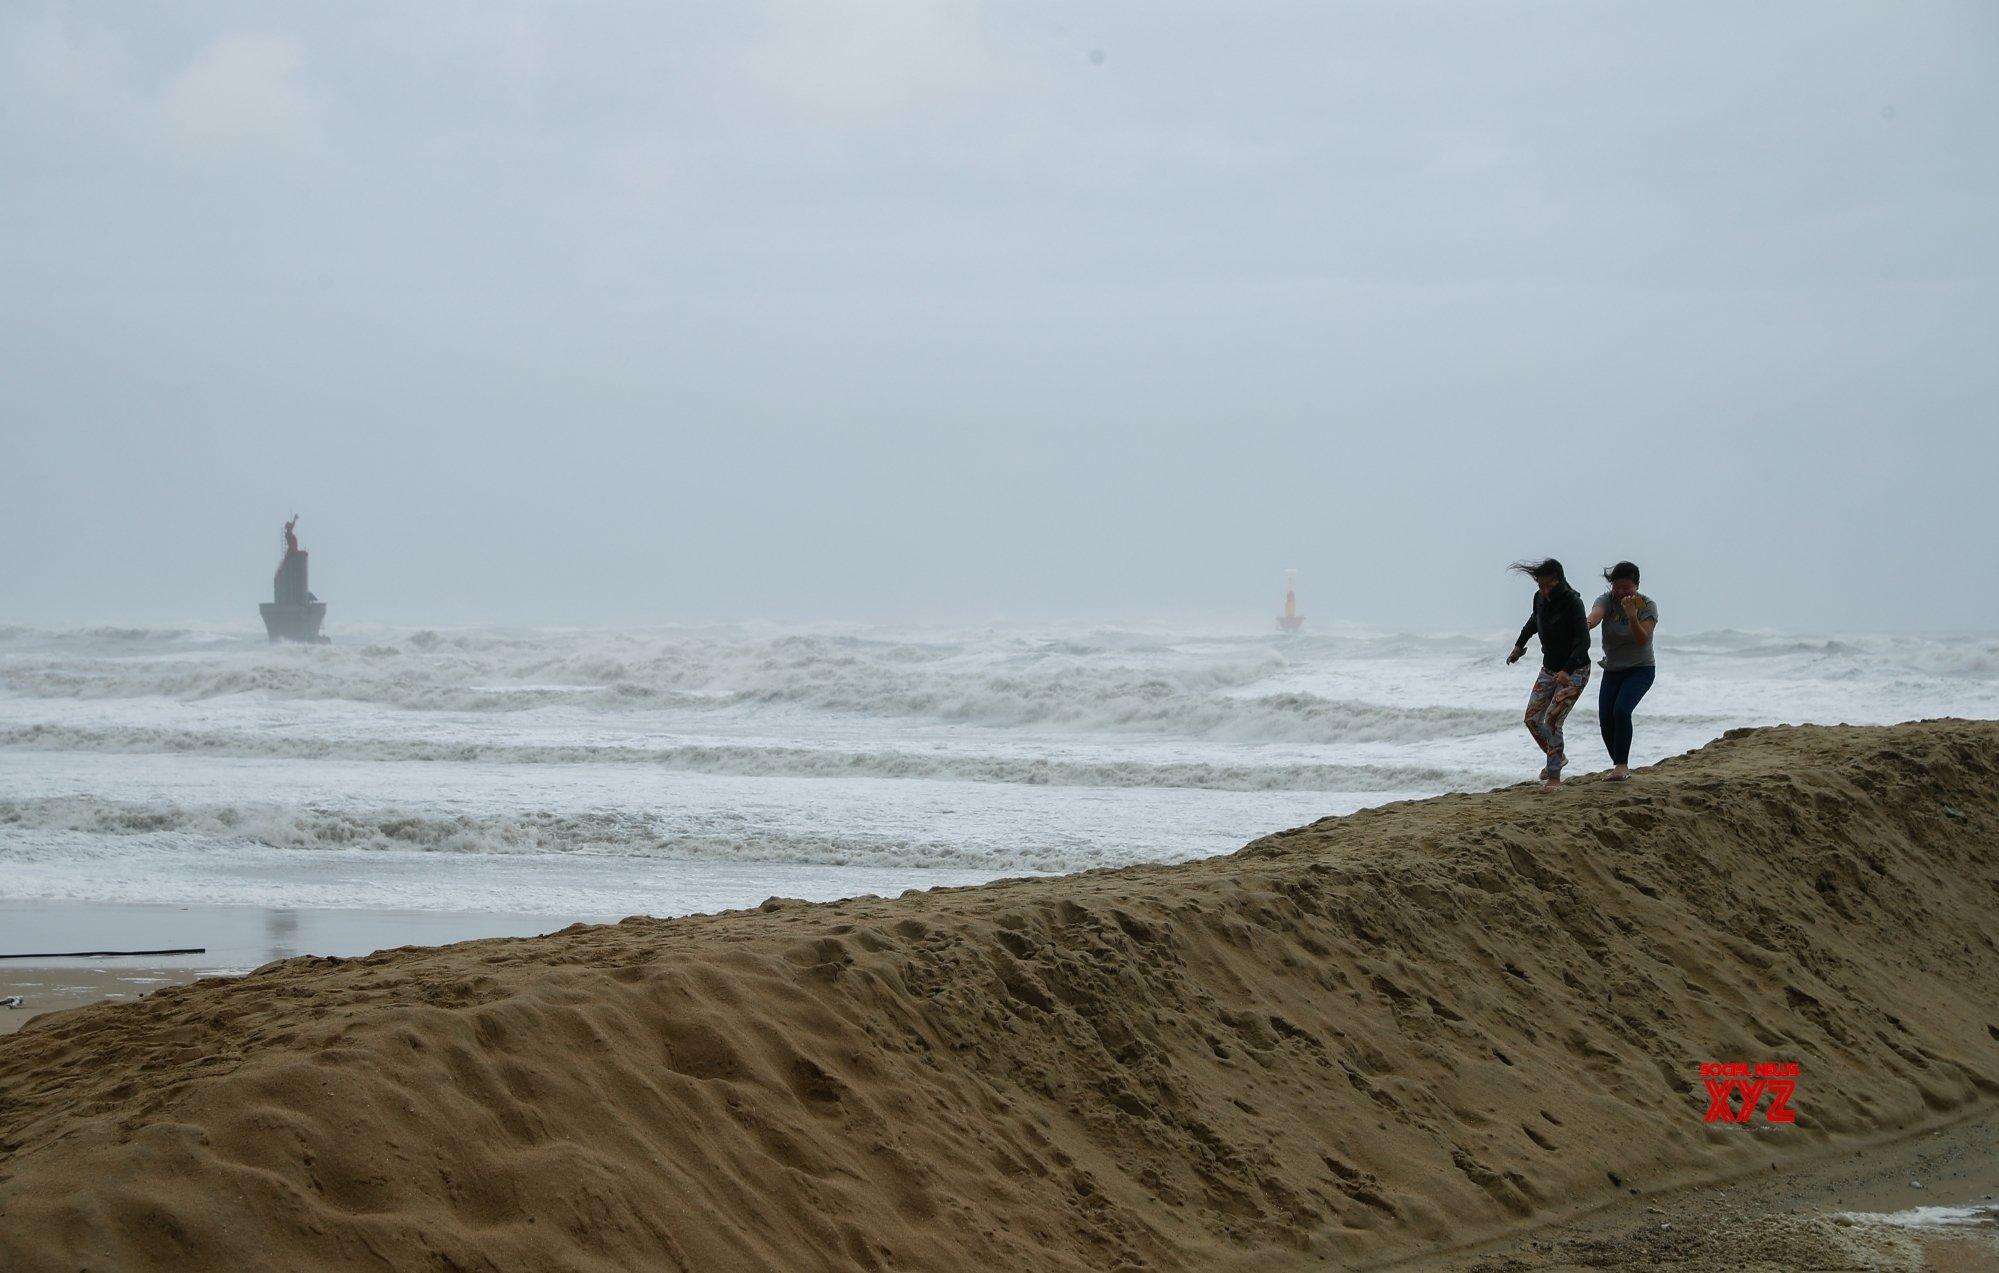 Japan braces for powerful typhoon Hagibis